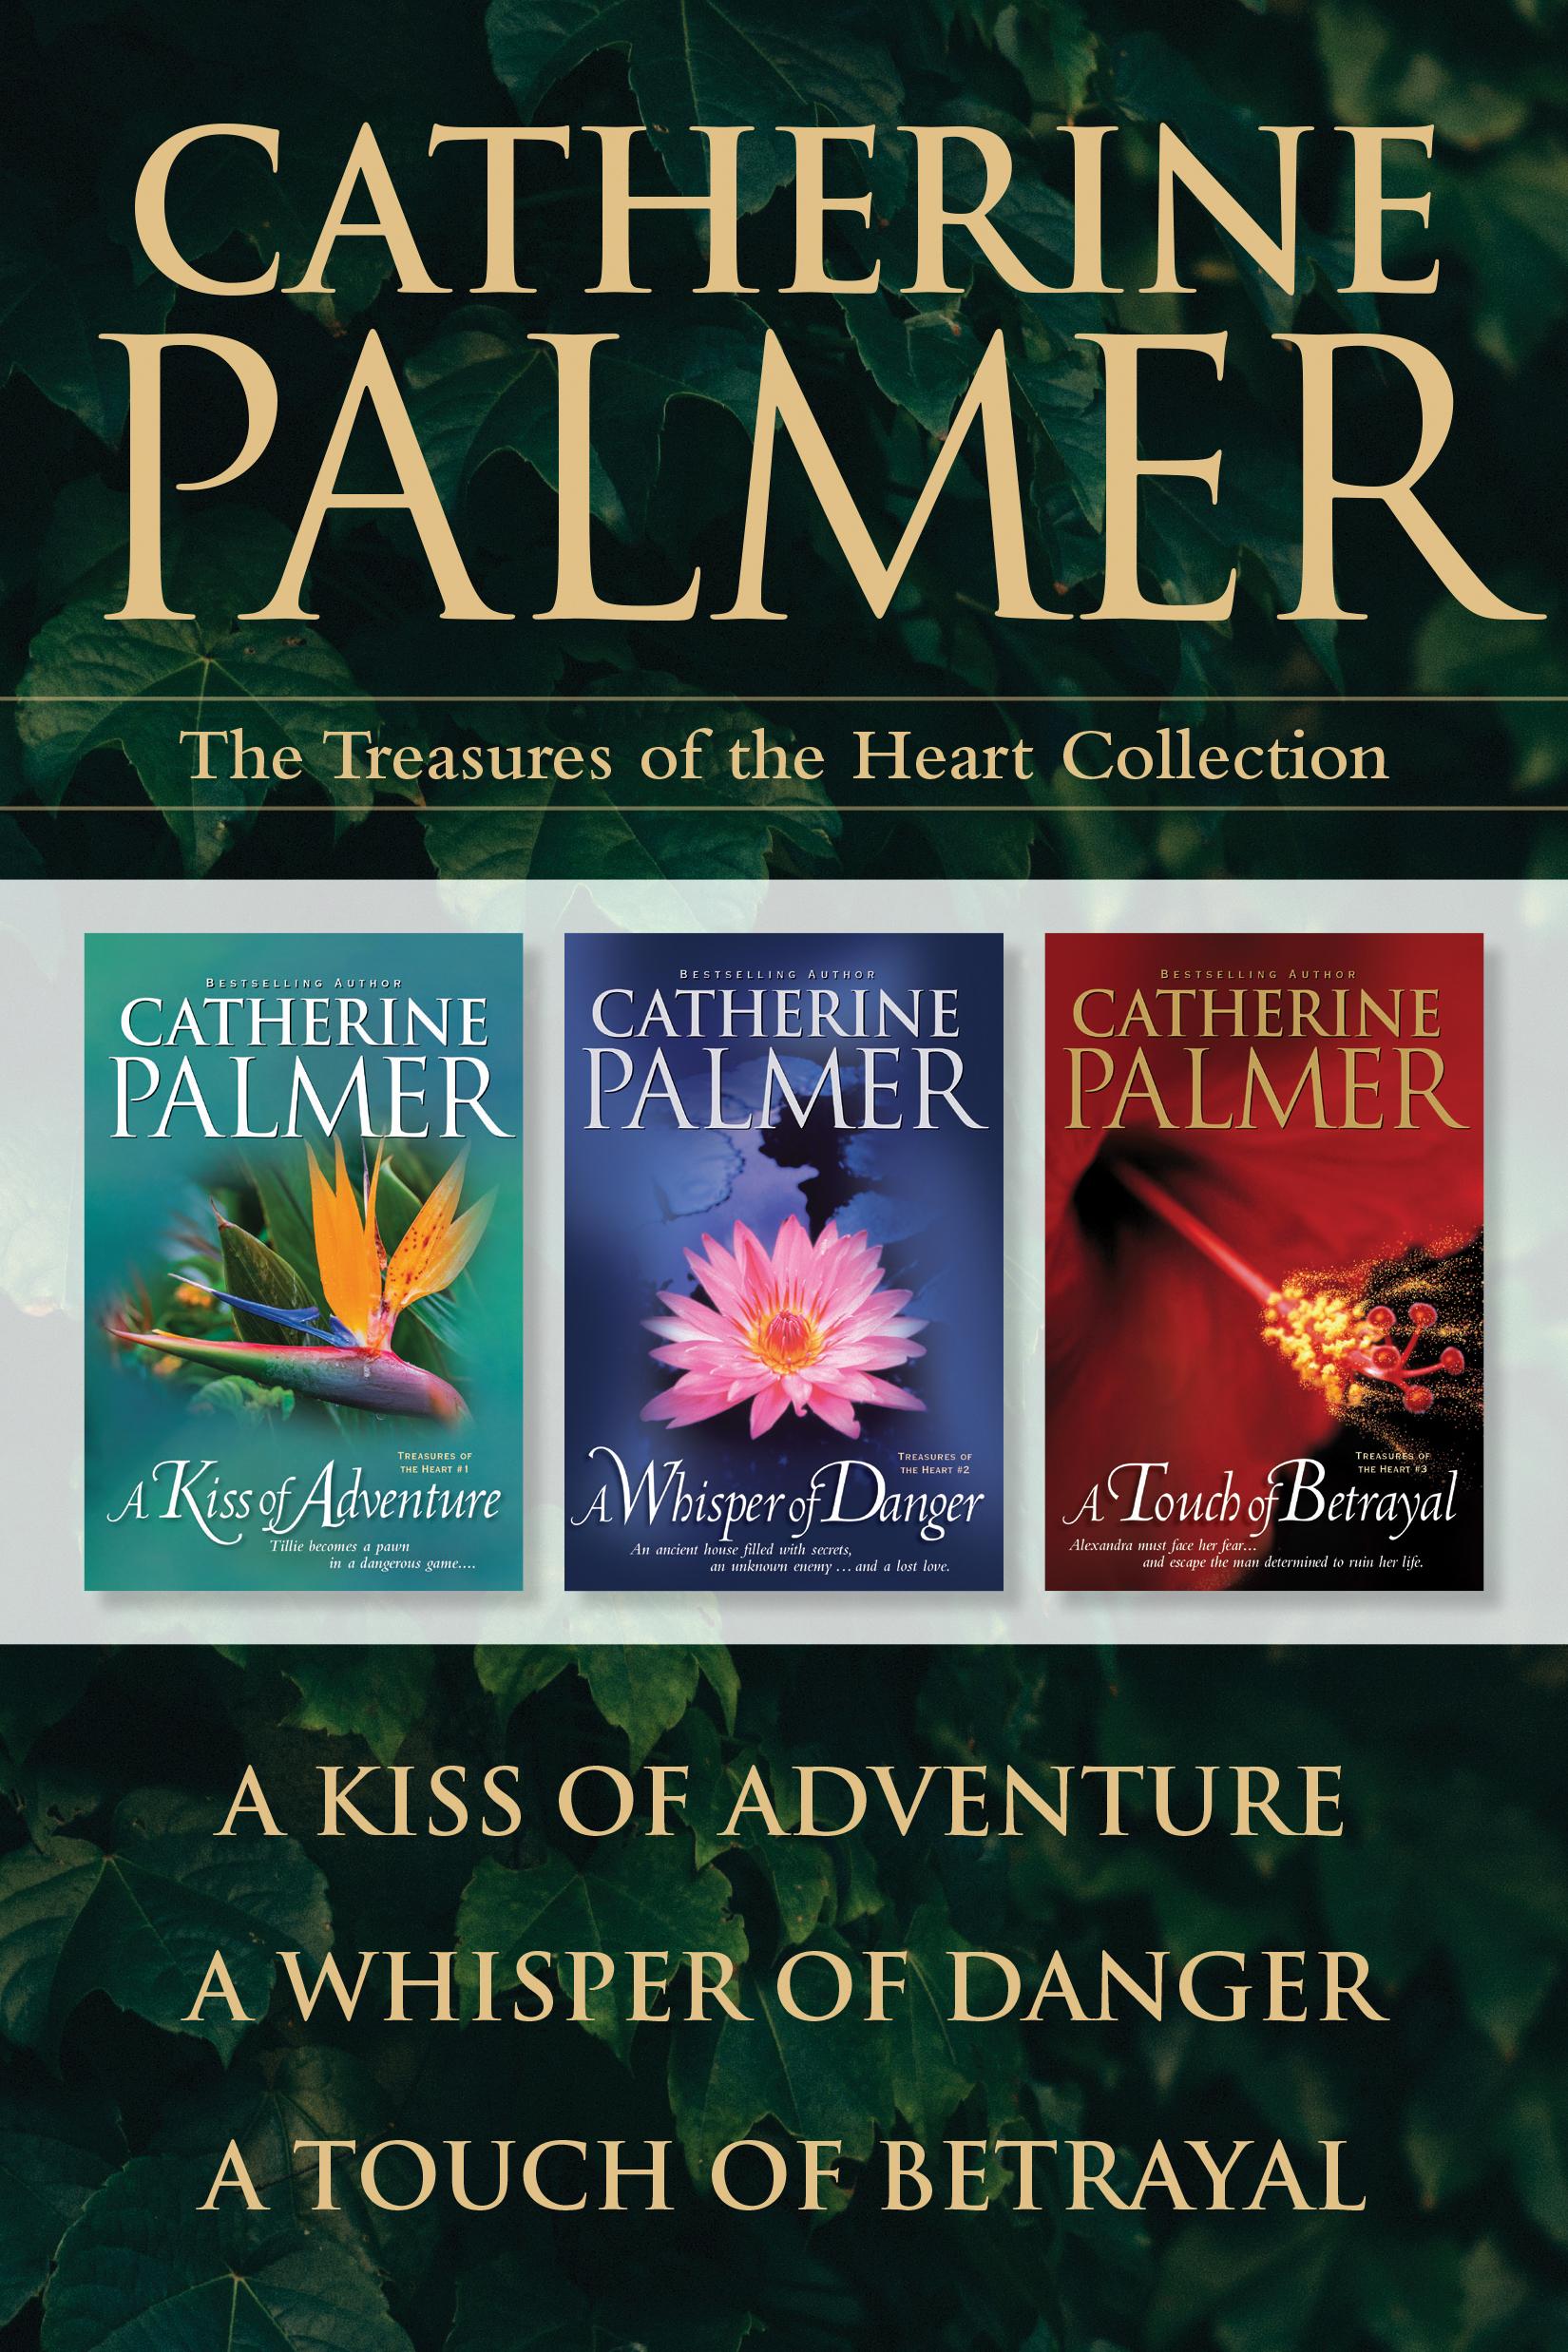 A Whisper of Danger (Treasures of the Heart Book 2)